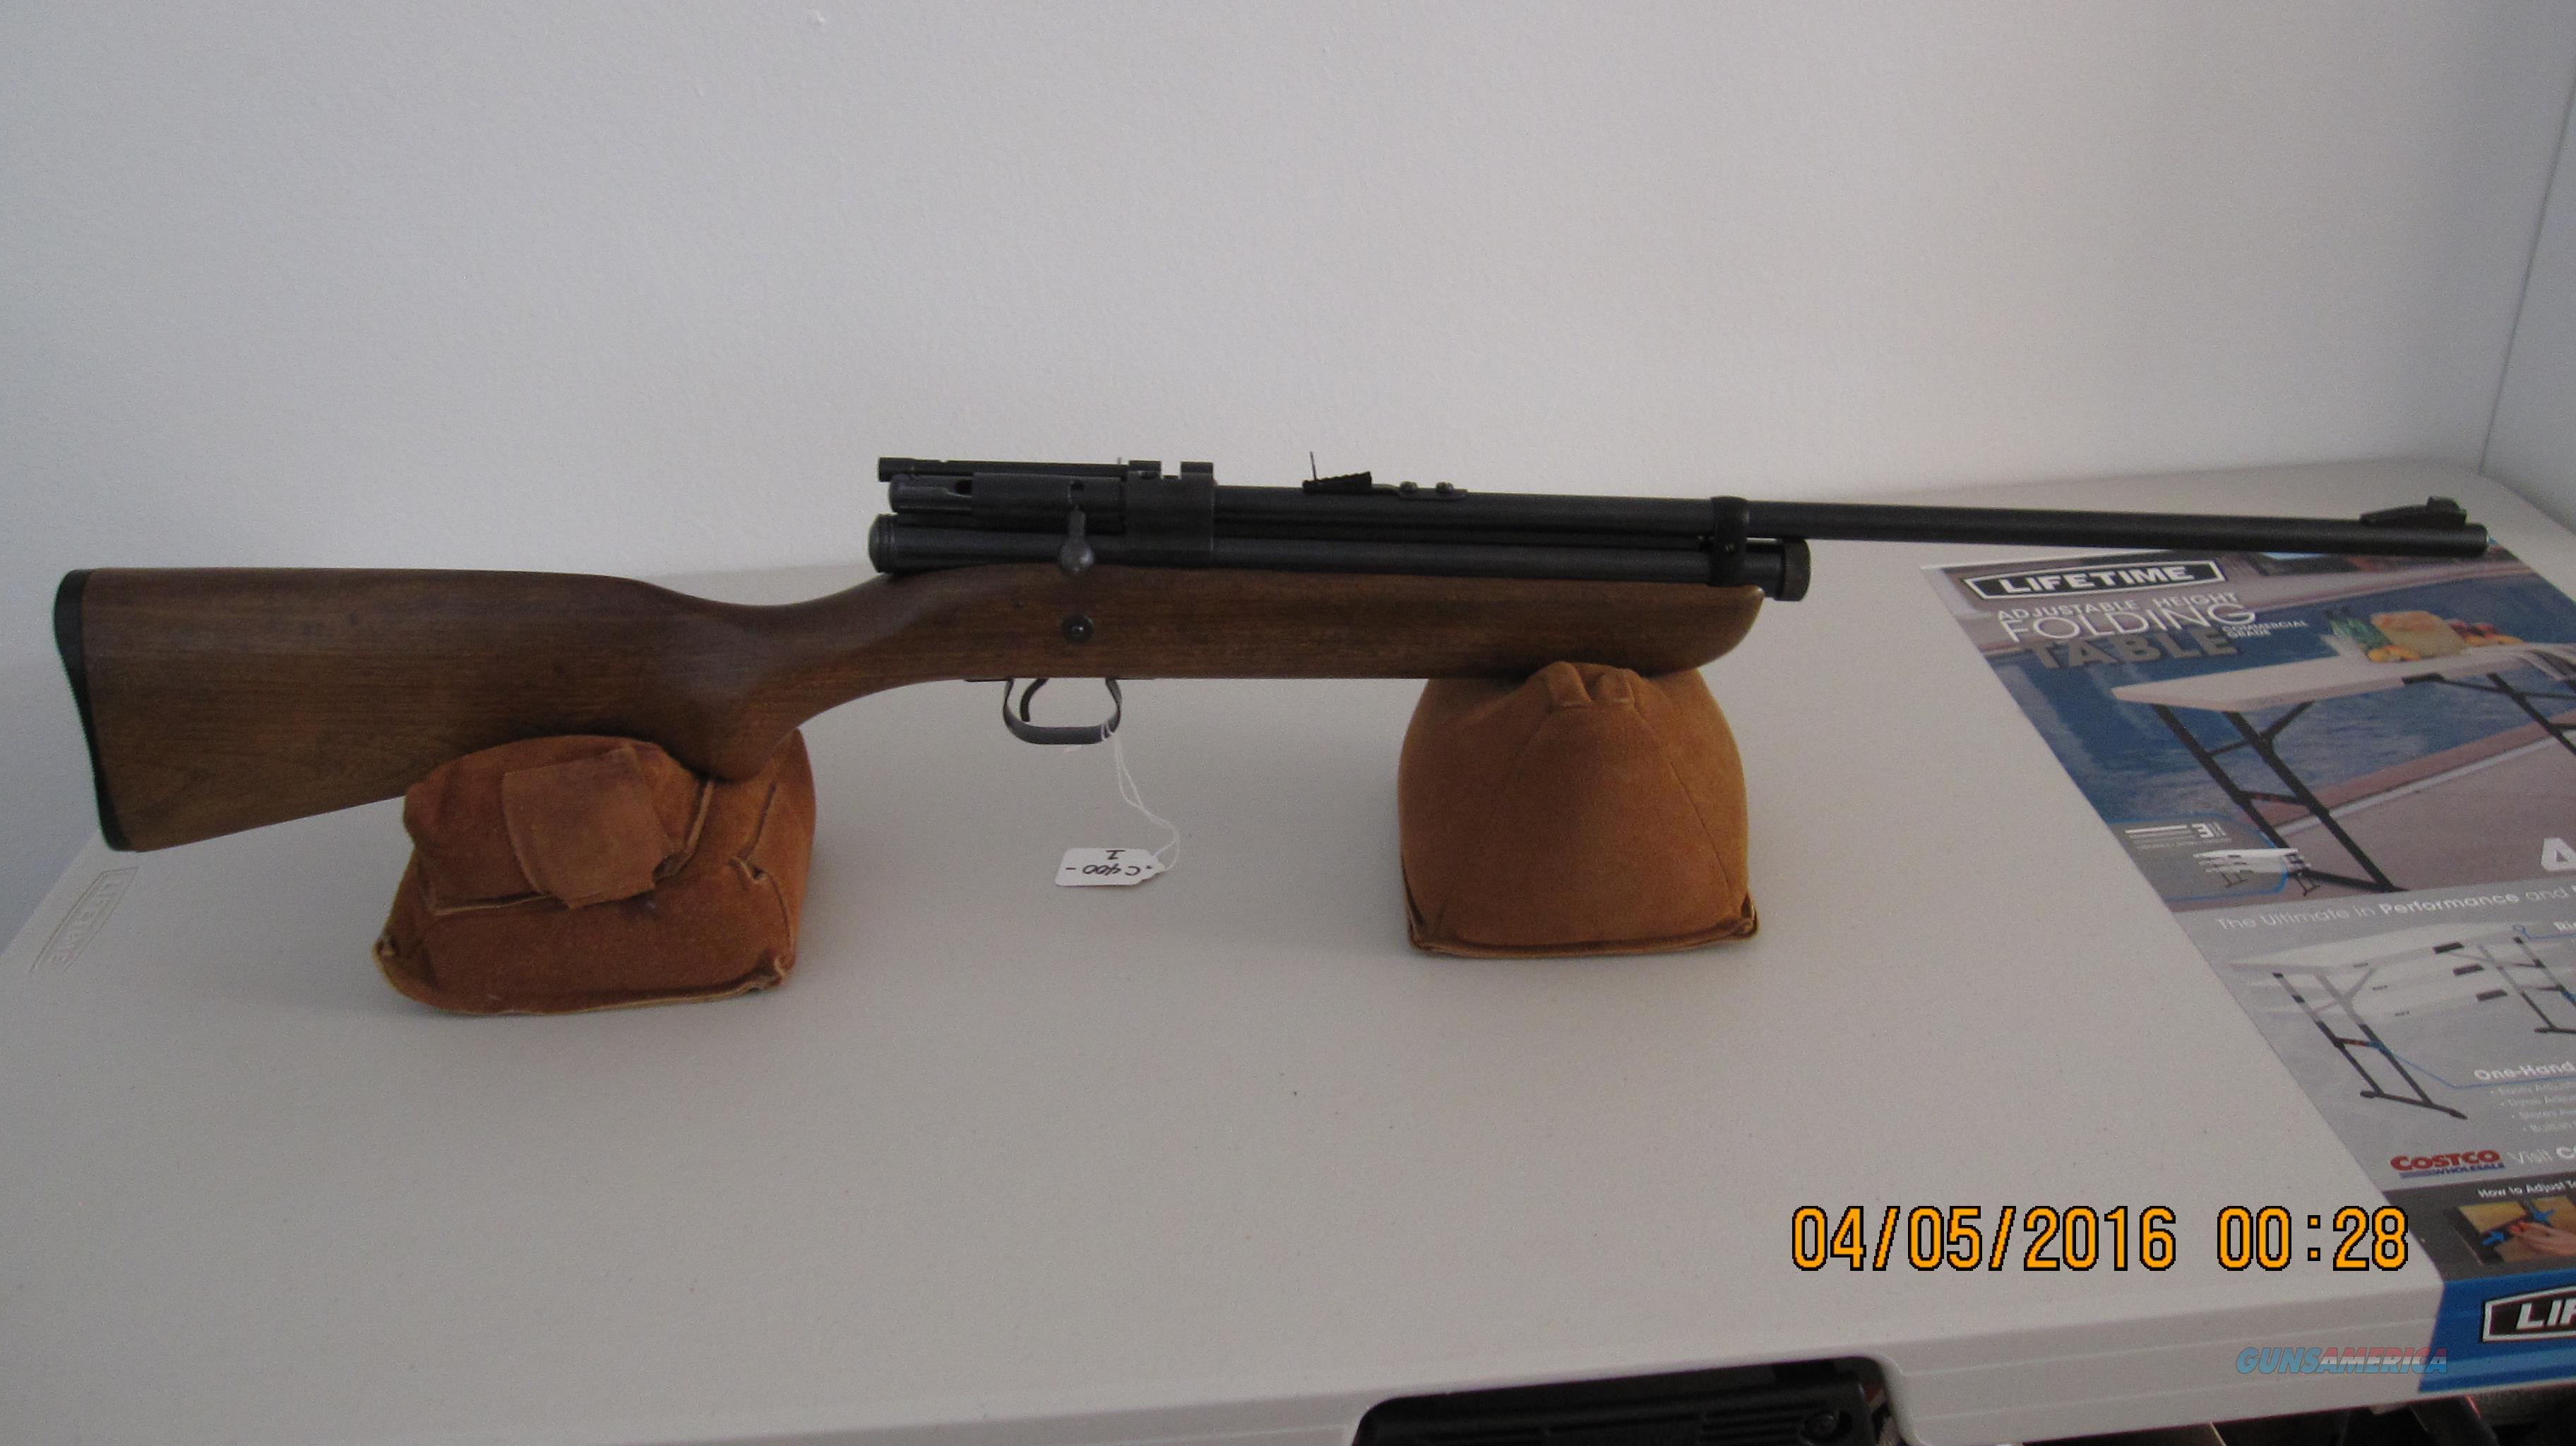 Crosman Model 400 Repeater CO2 Rifle in .22 Caliber  Non-Guns > Air Rifles - Pistols > CO2 Rifle